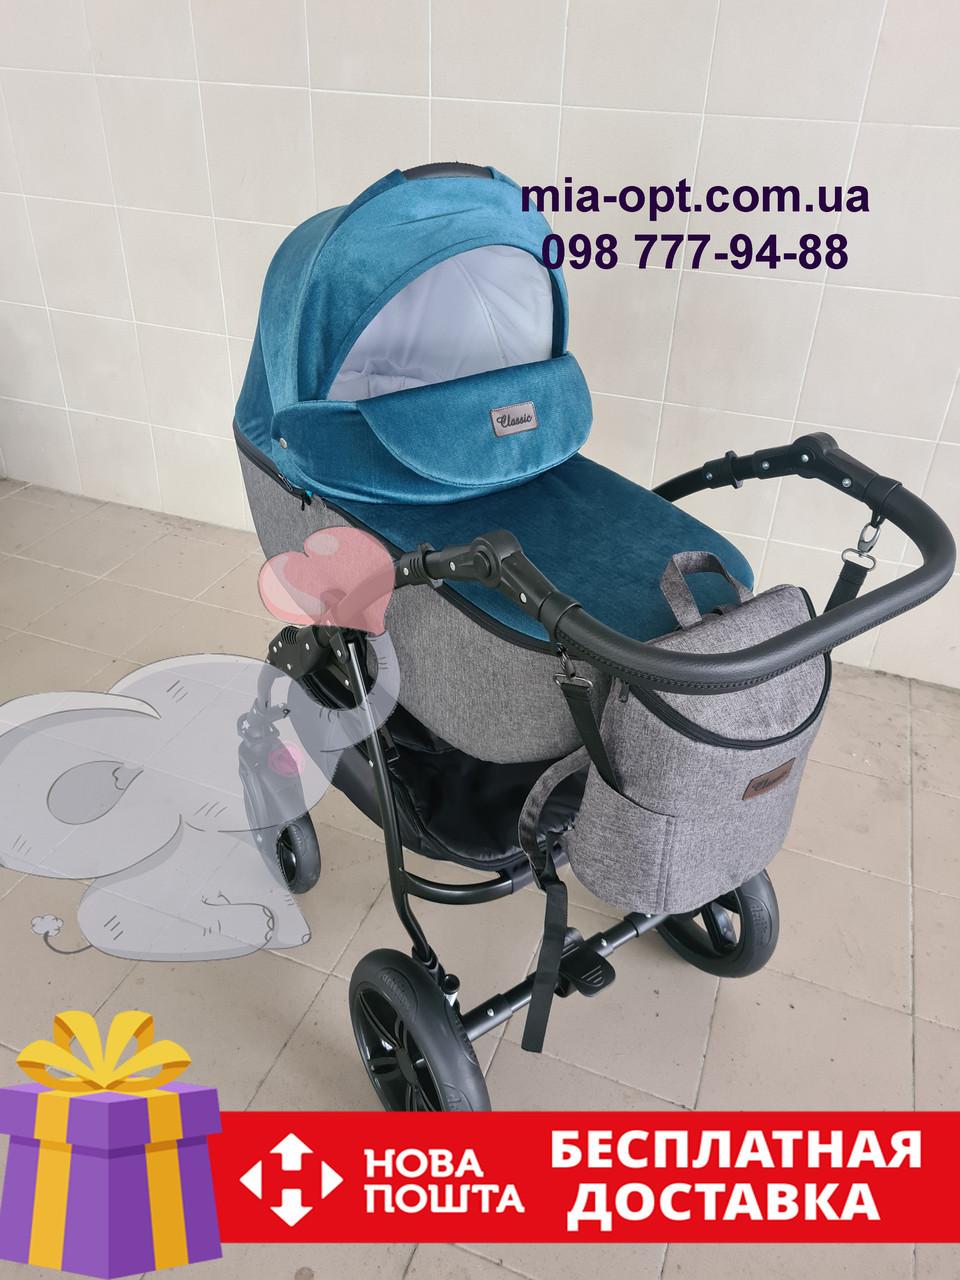 Детская коляска 2 в 1 Classik Len(Классик Лен) Victoria Gold графит бирюза